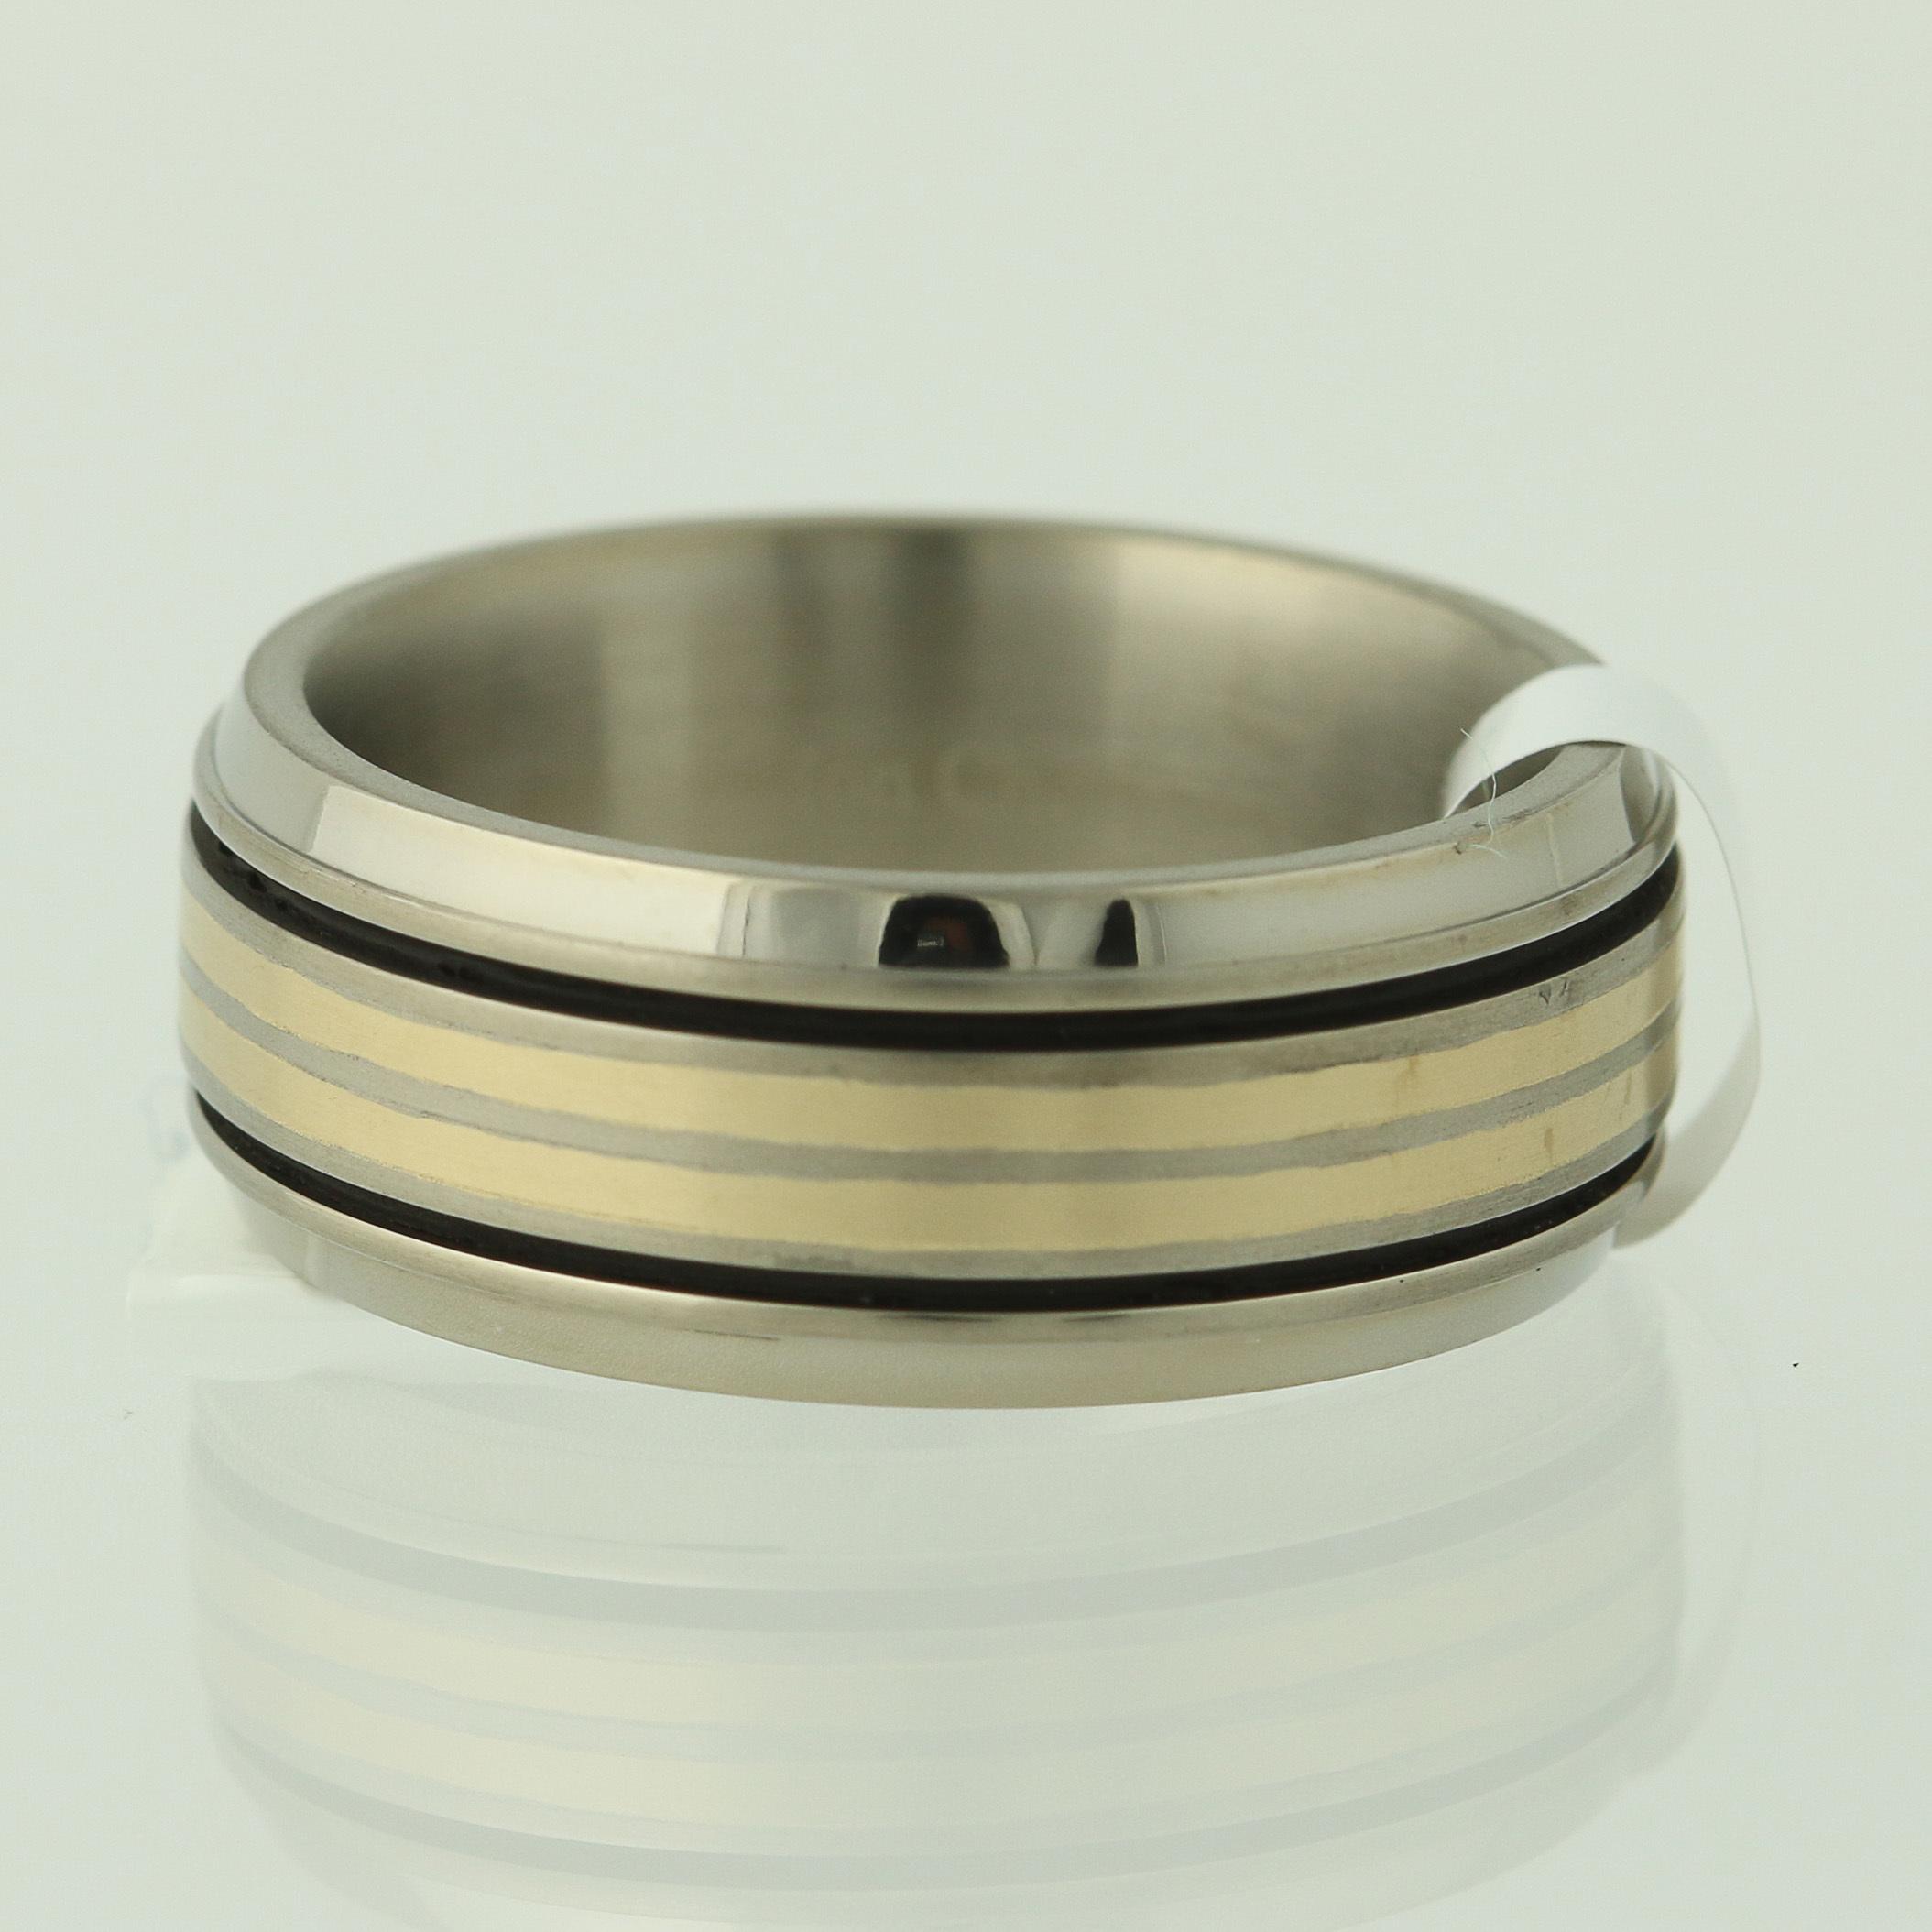 NEW Men/'s Wedding Band Titanium /& 18k Ring 8 Comfort Fit Gold Mon Cheri 2-Toned